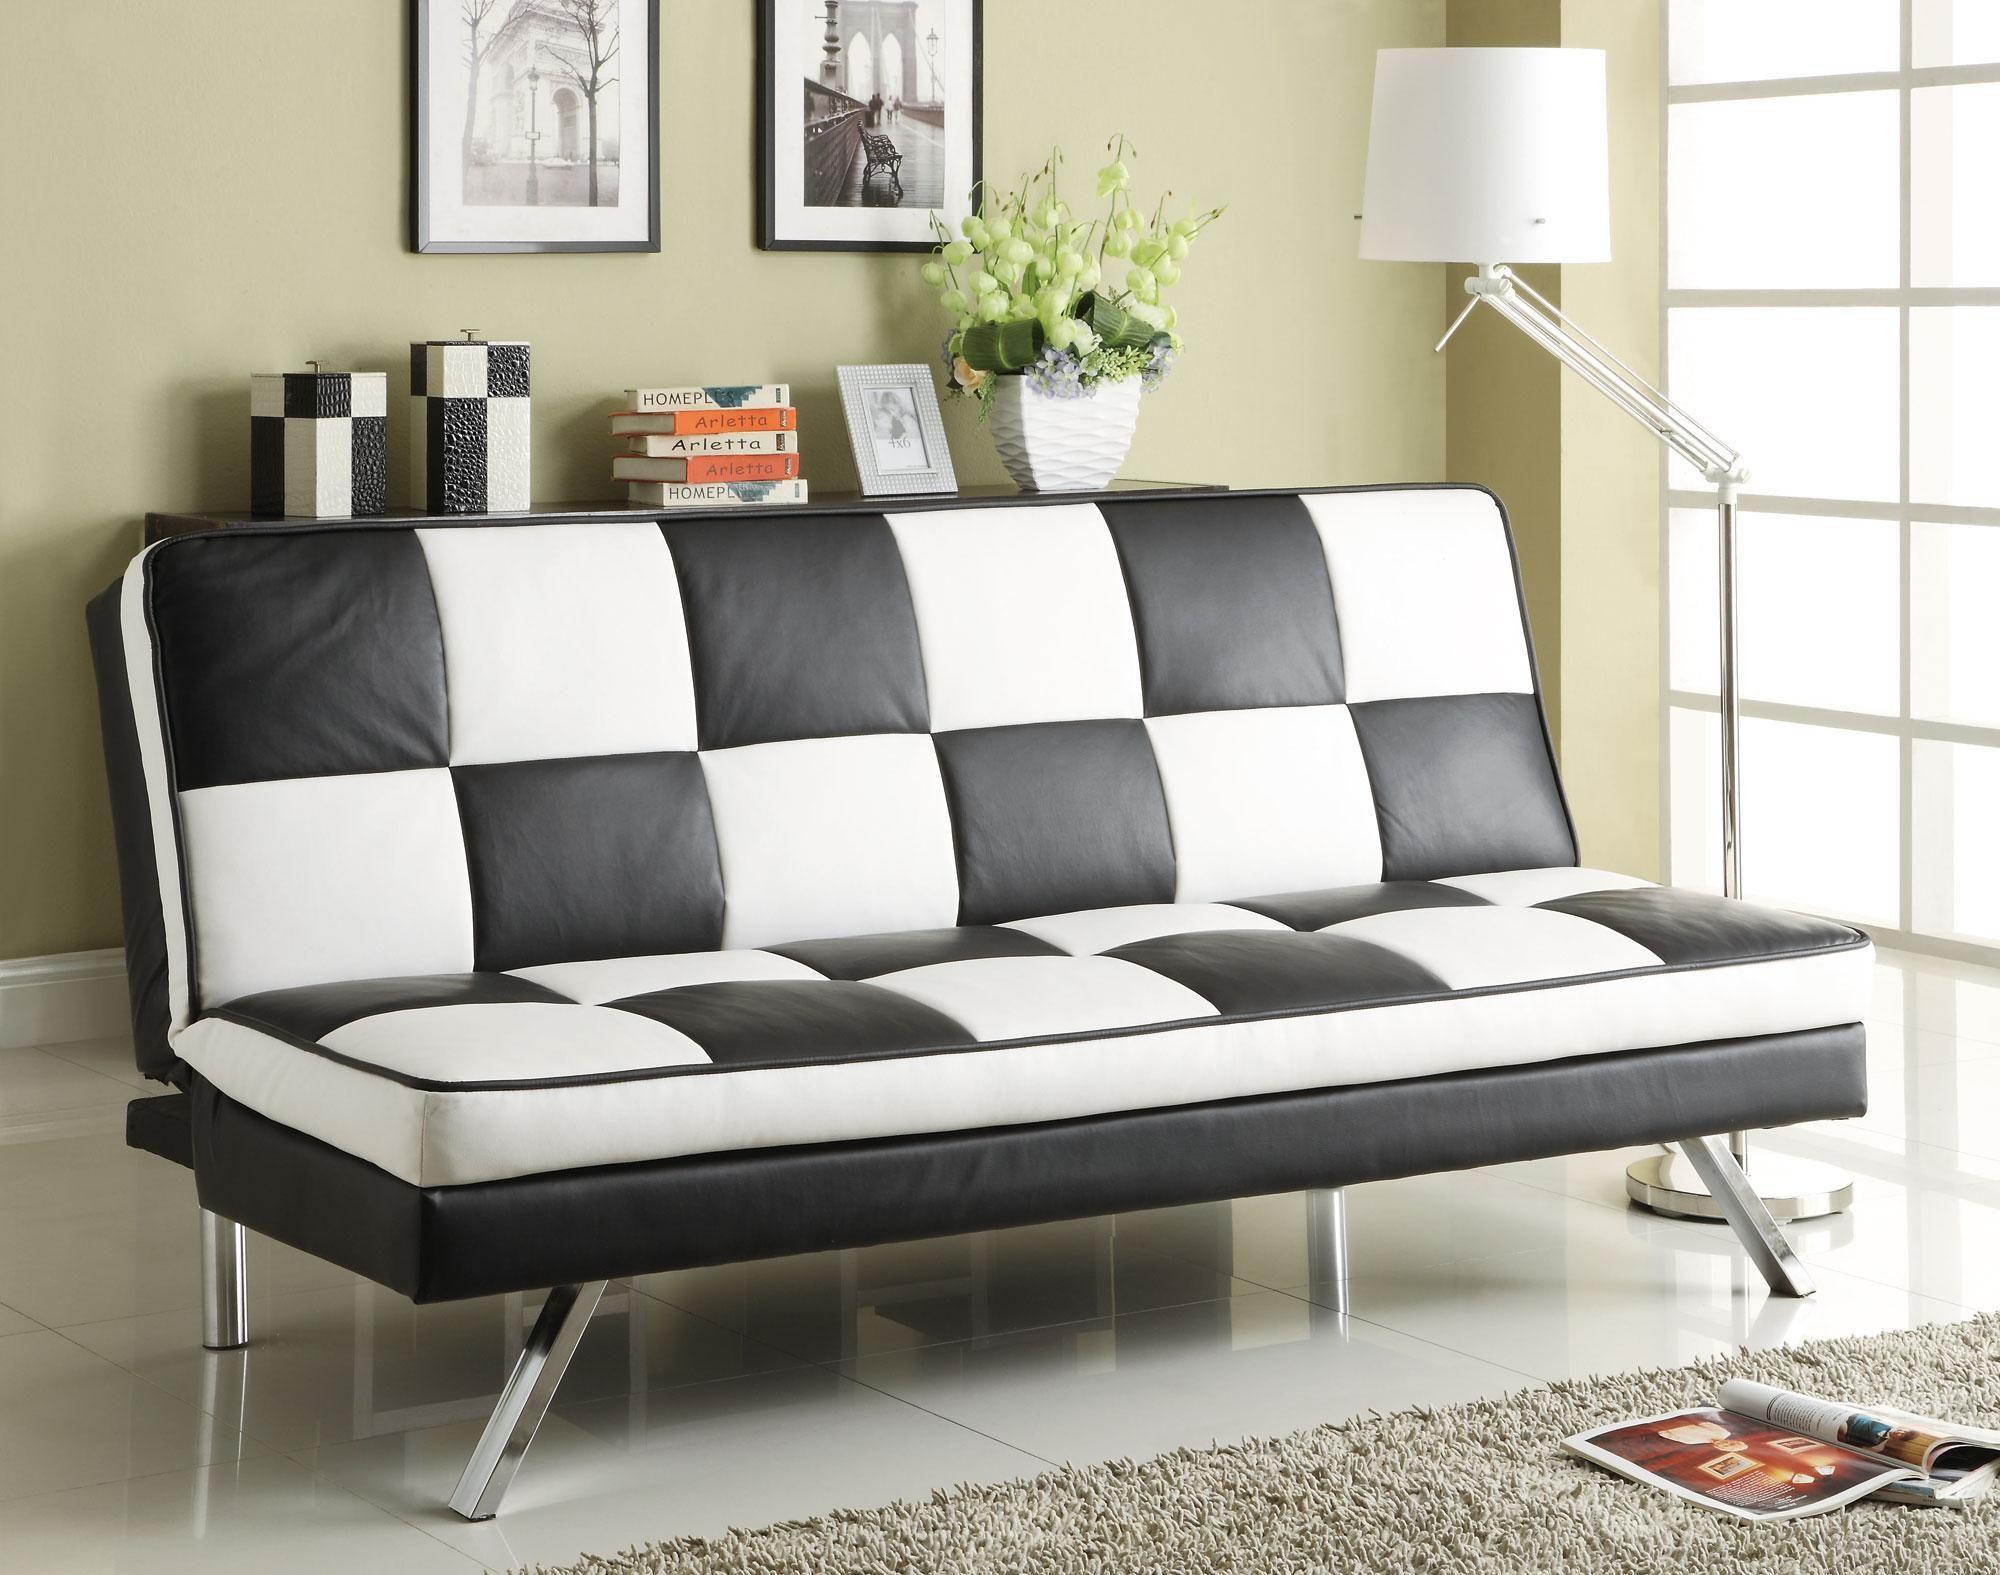 Couch Under 100 In 2020 Retro Sofa Bed Futon Sofa Bed